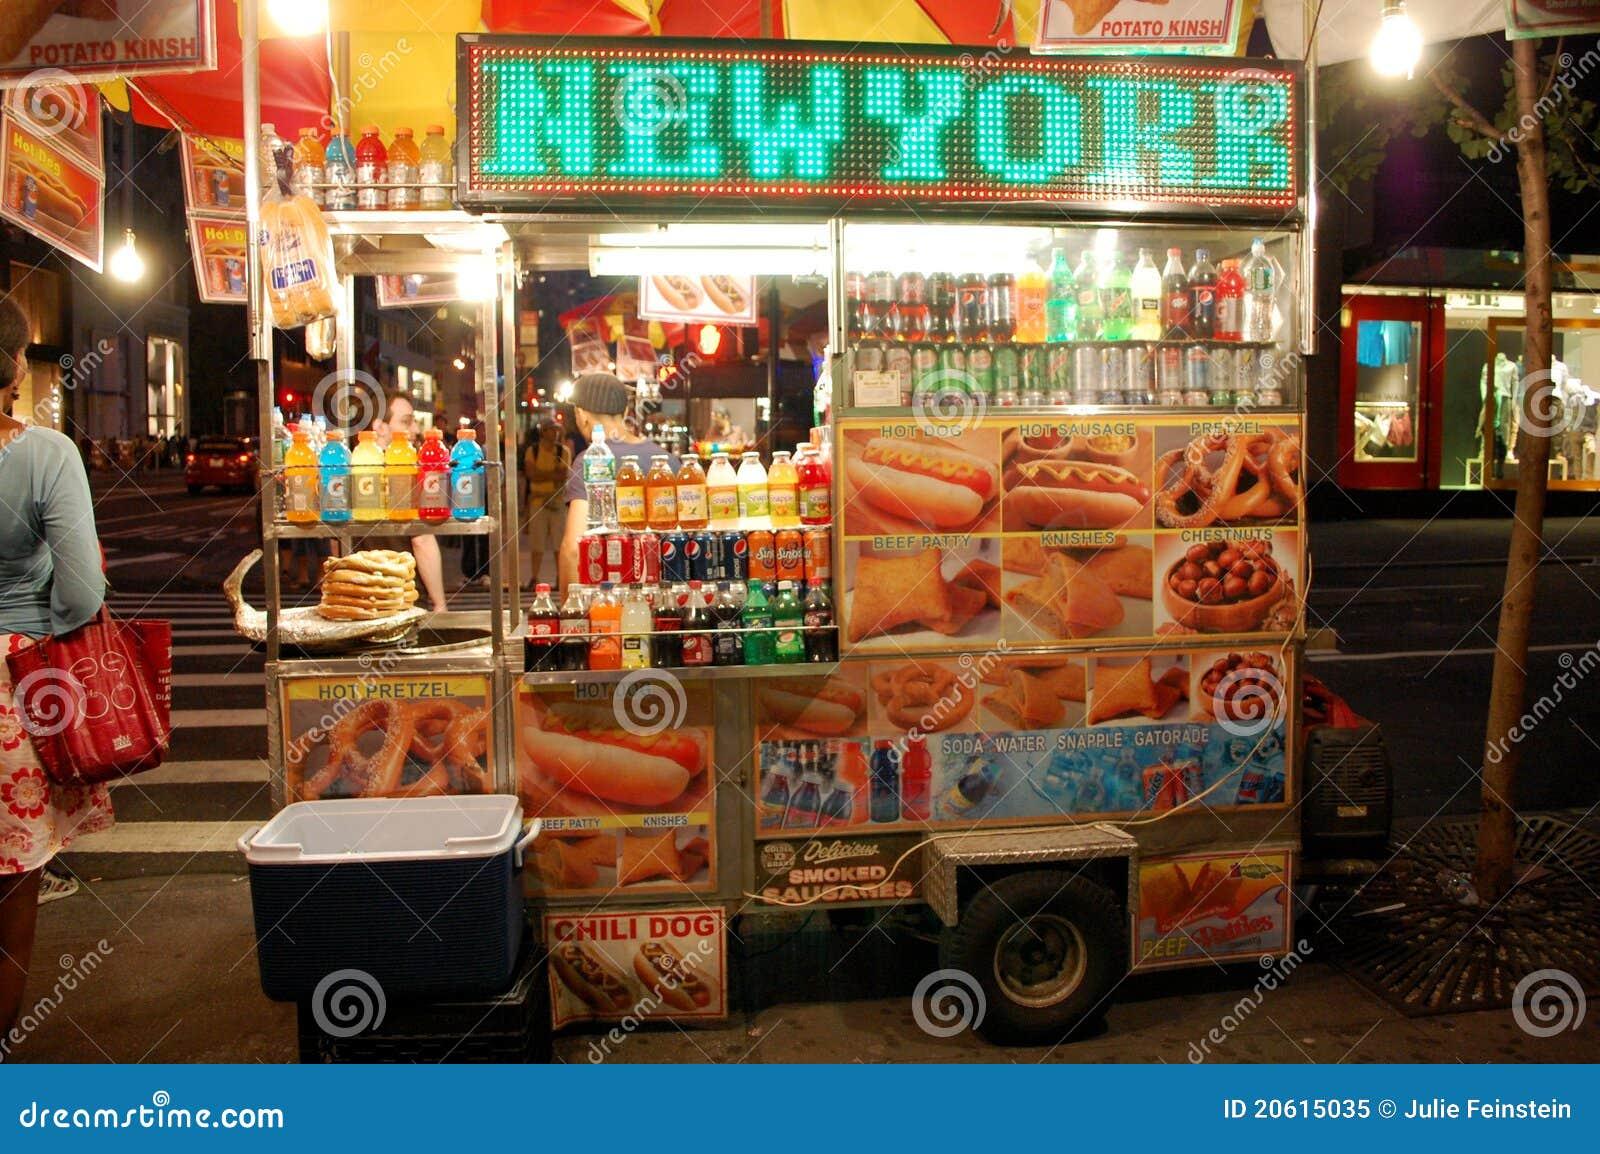 Sabrett Hot Dogs For Sale